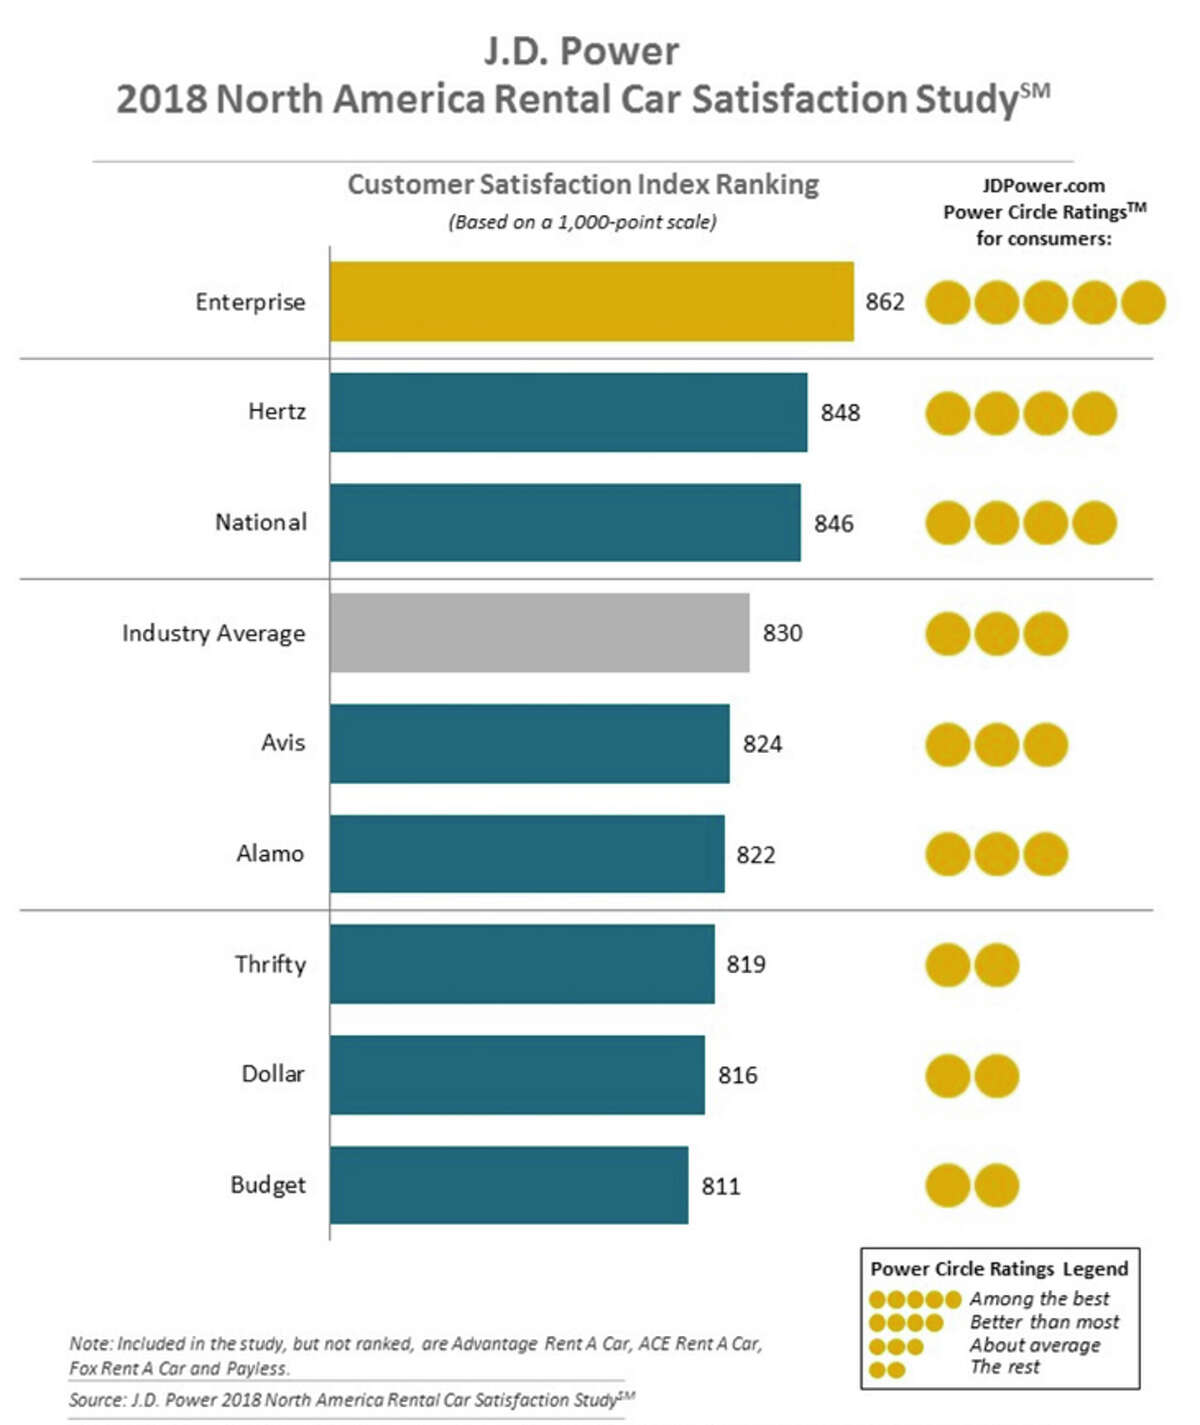 Enterprise topped the rankings in J.D. Power's 2018 car rental customer satisfaction survey.